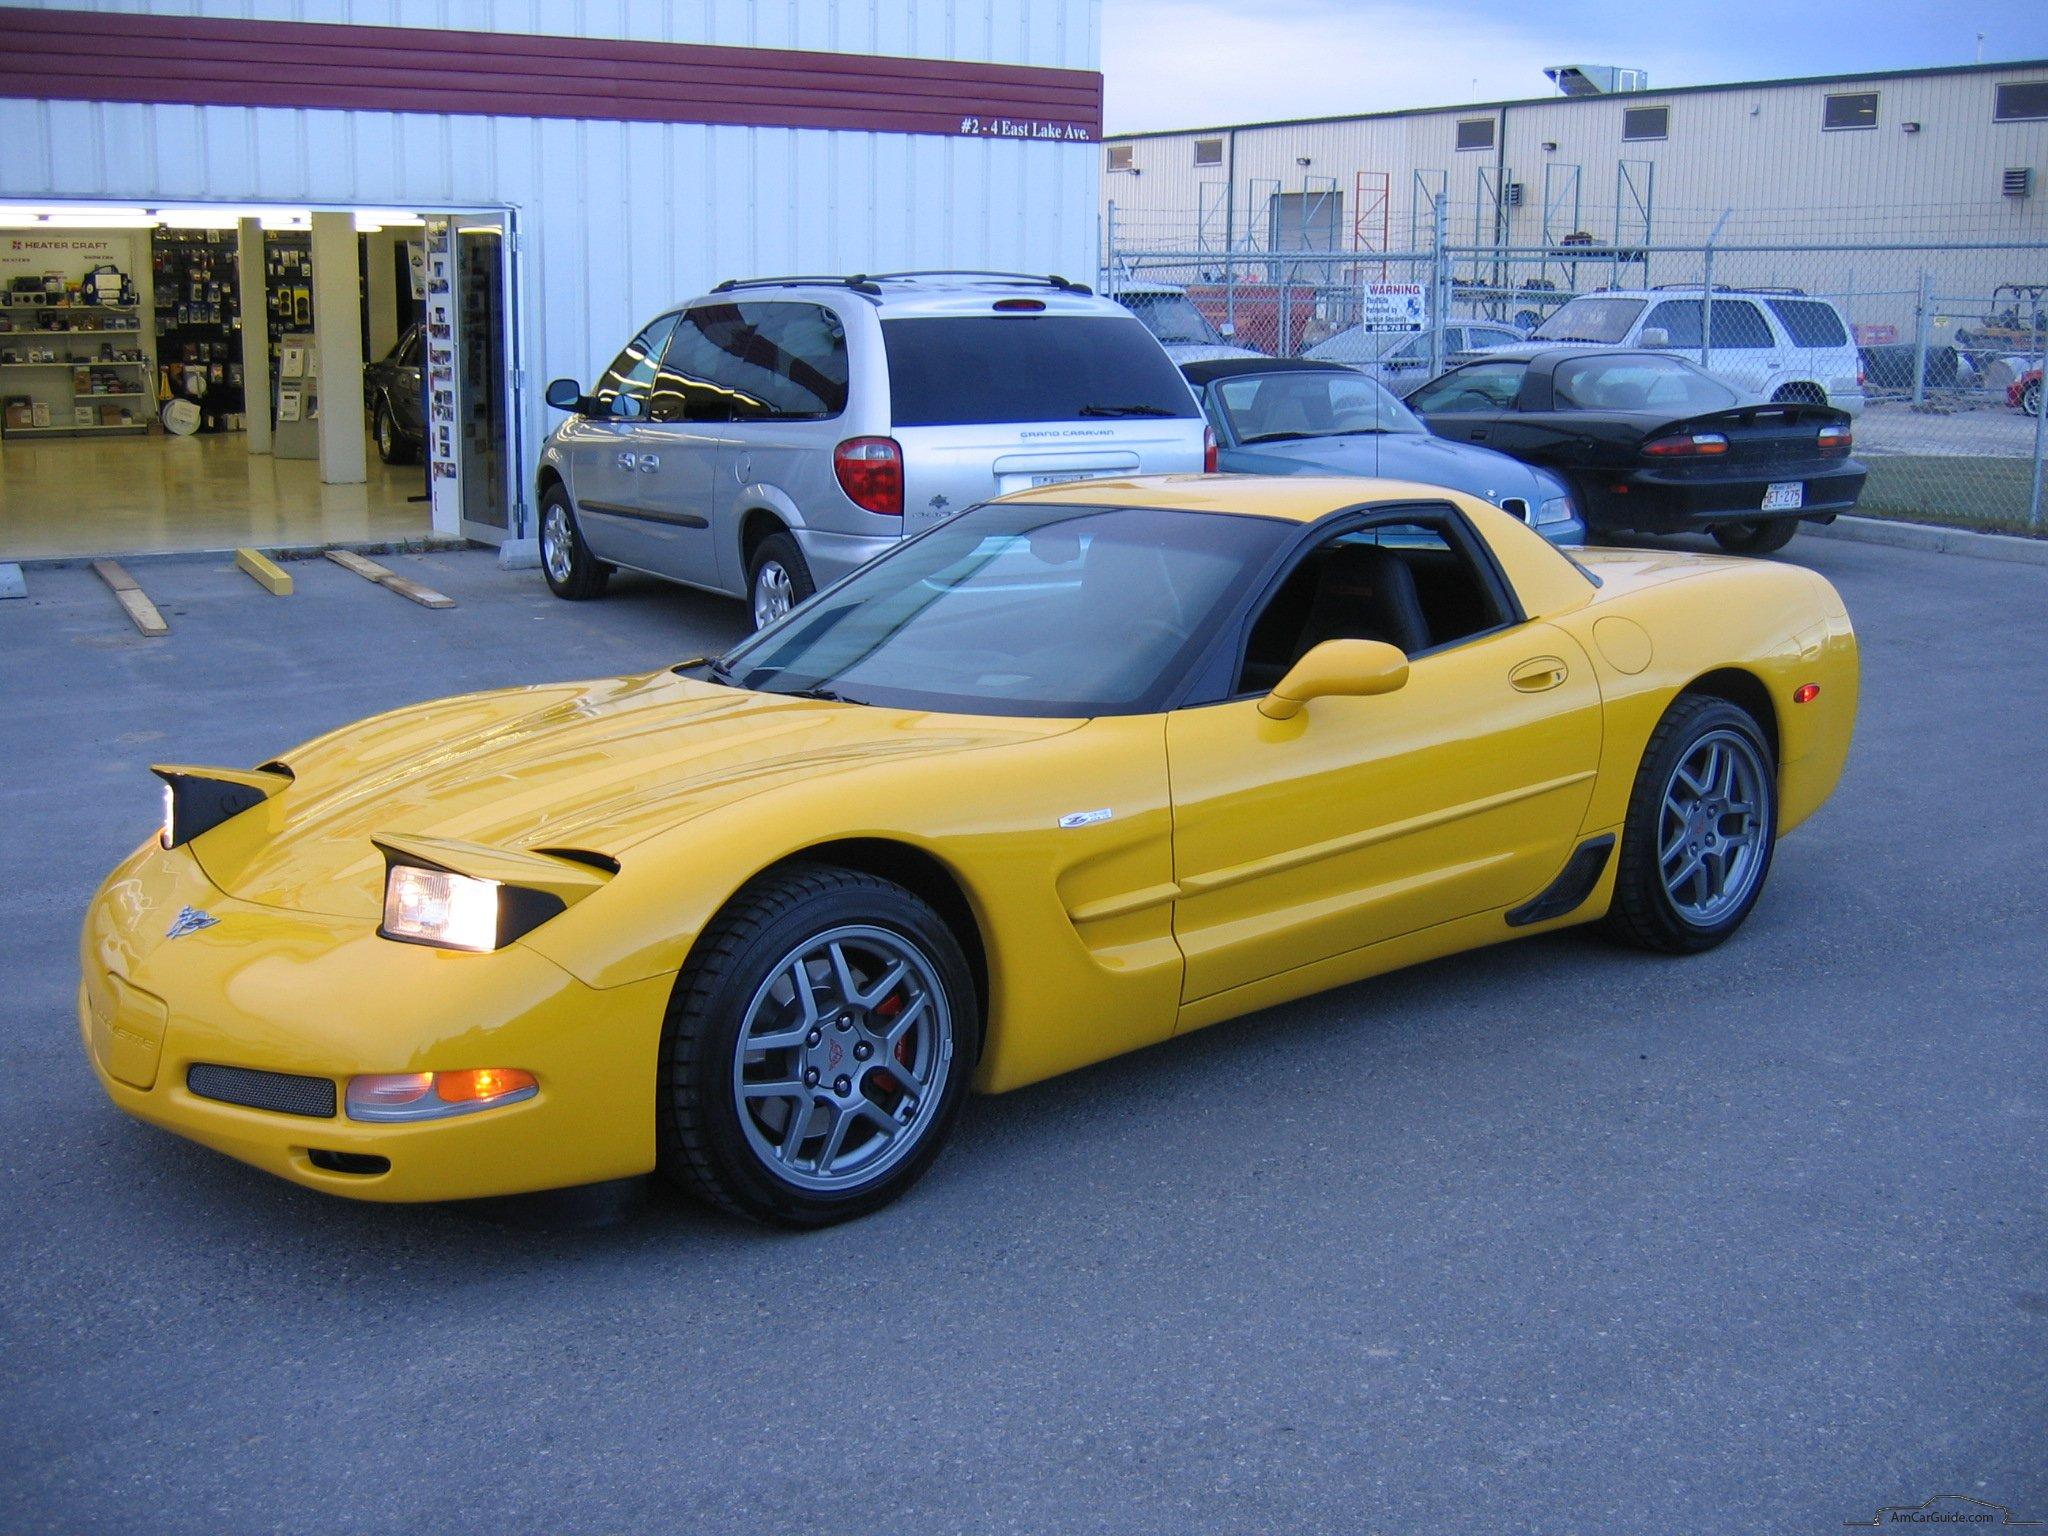 2003 chevrolet corvette size 535 kb resolution 2048x1536 type link file src